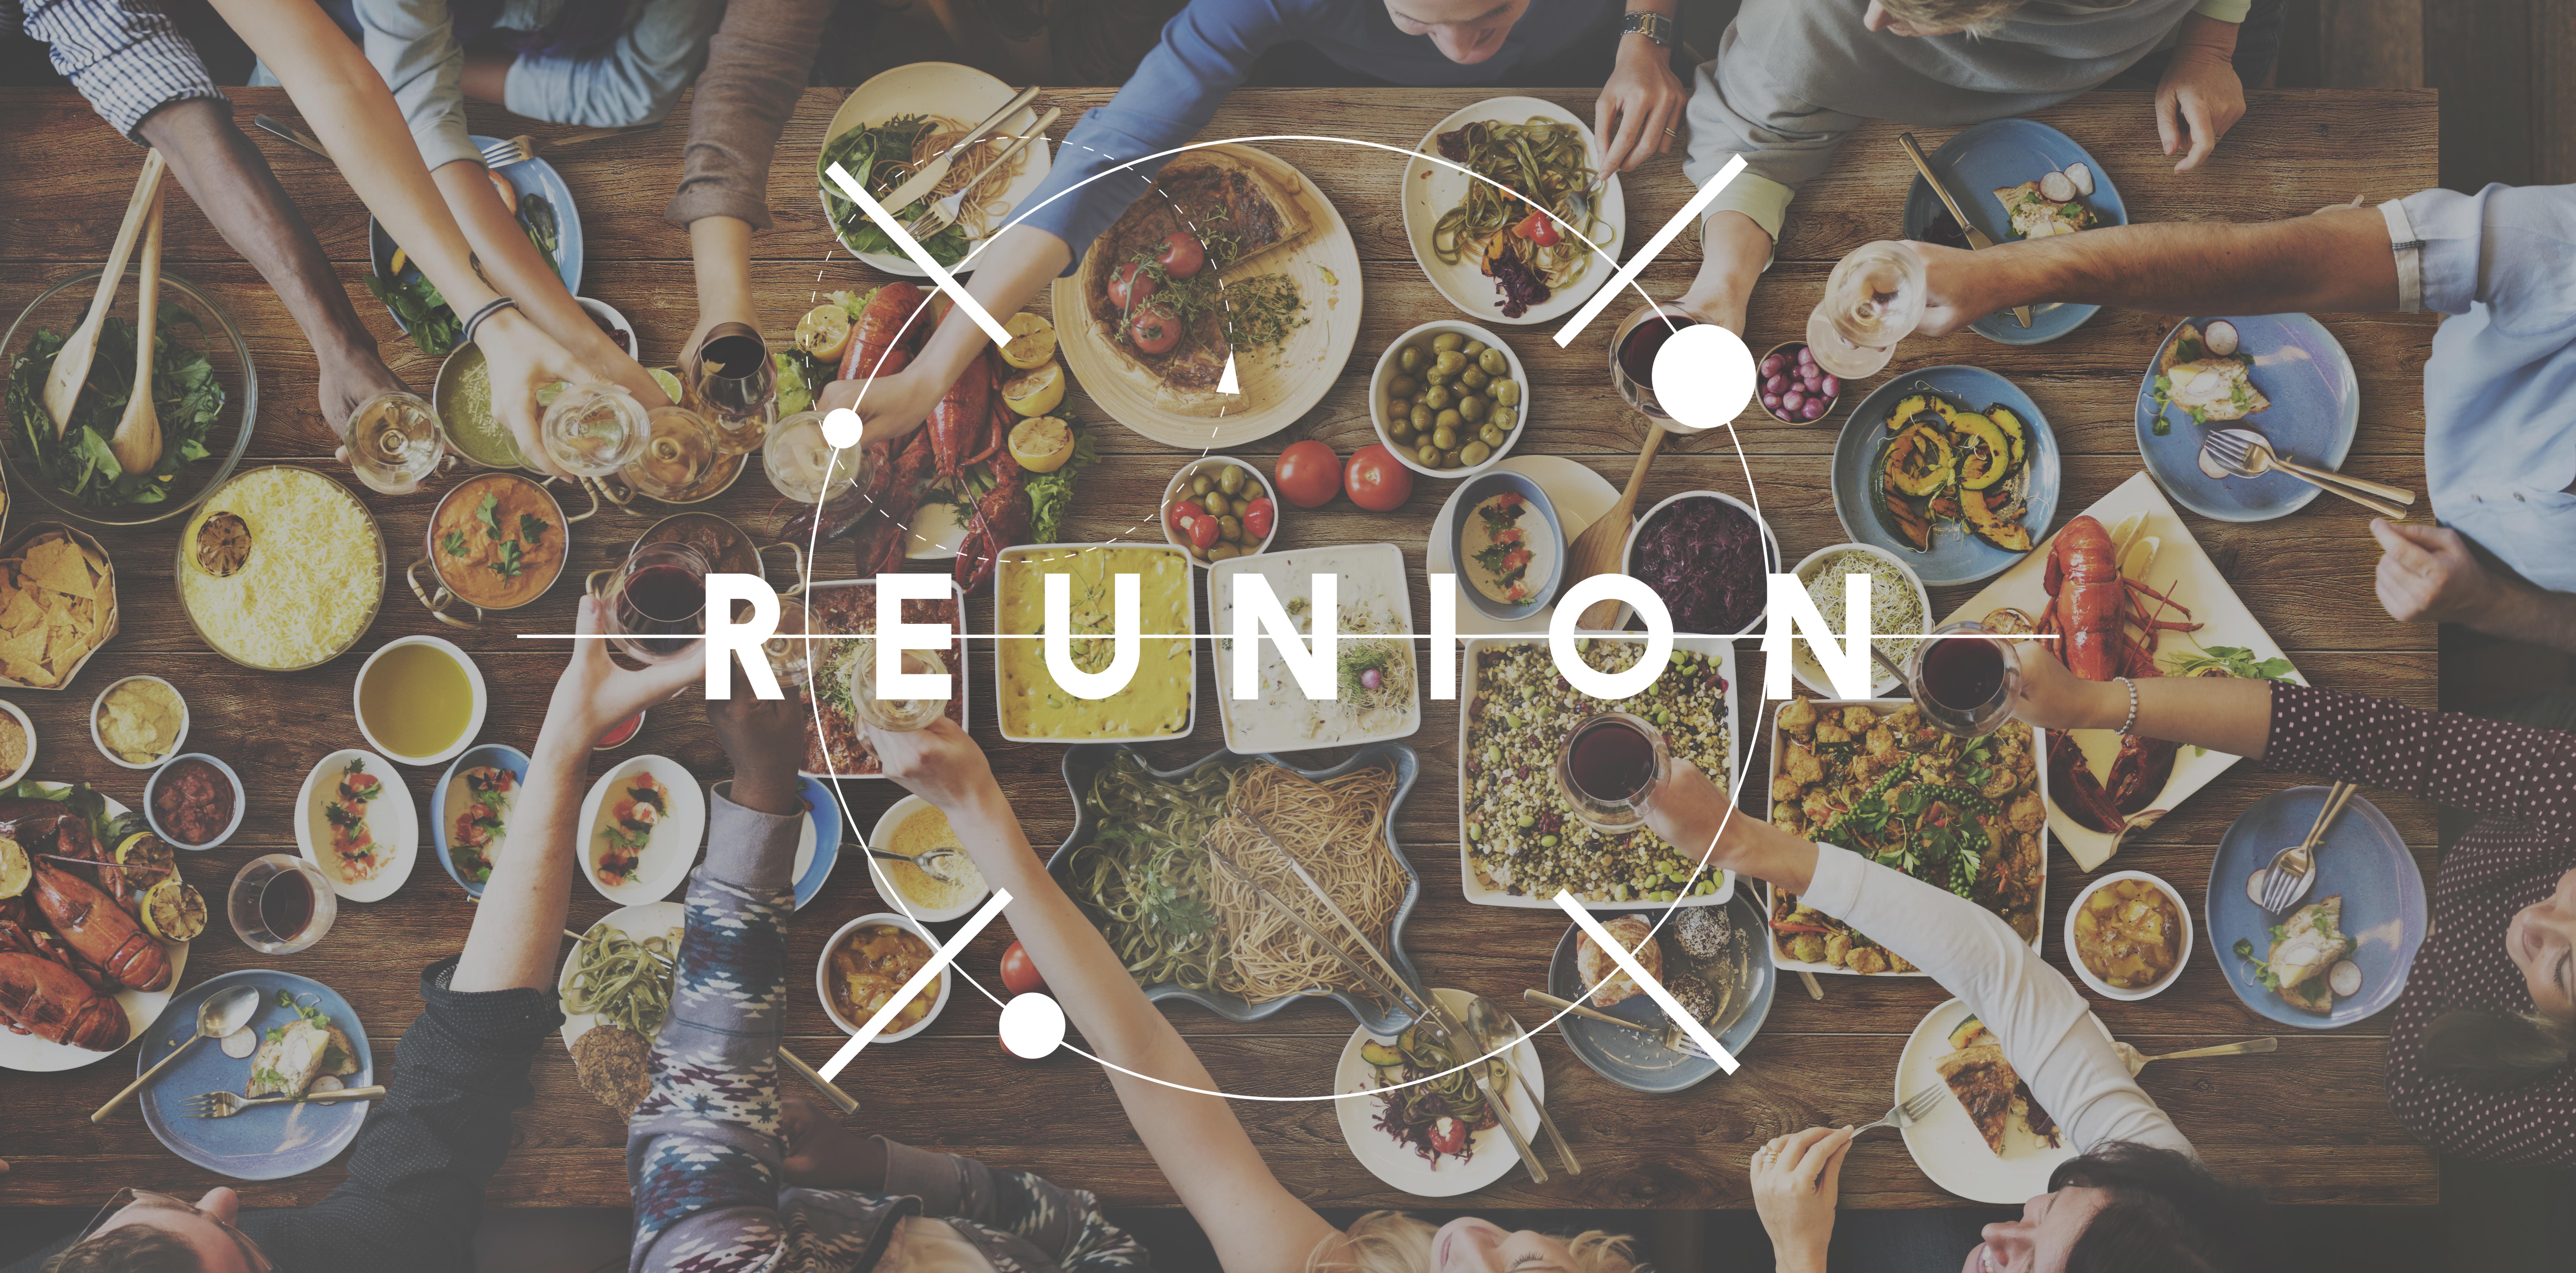 2017 Part 1: Reunions